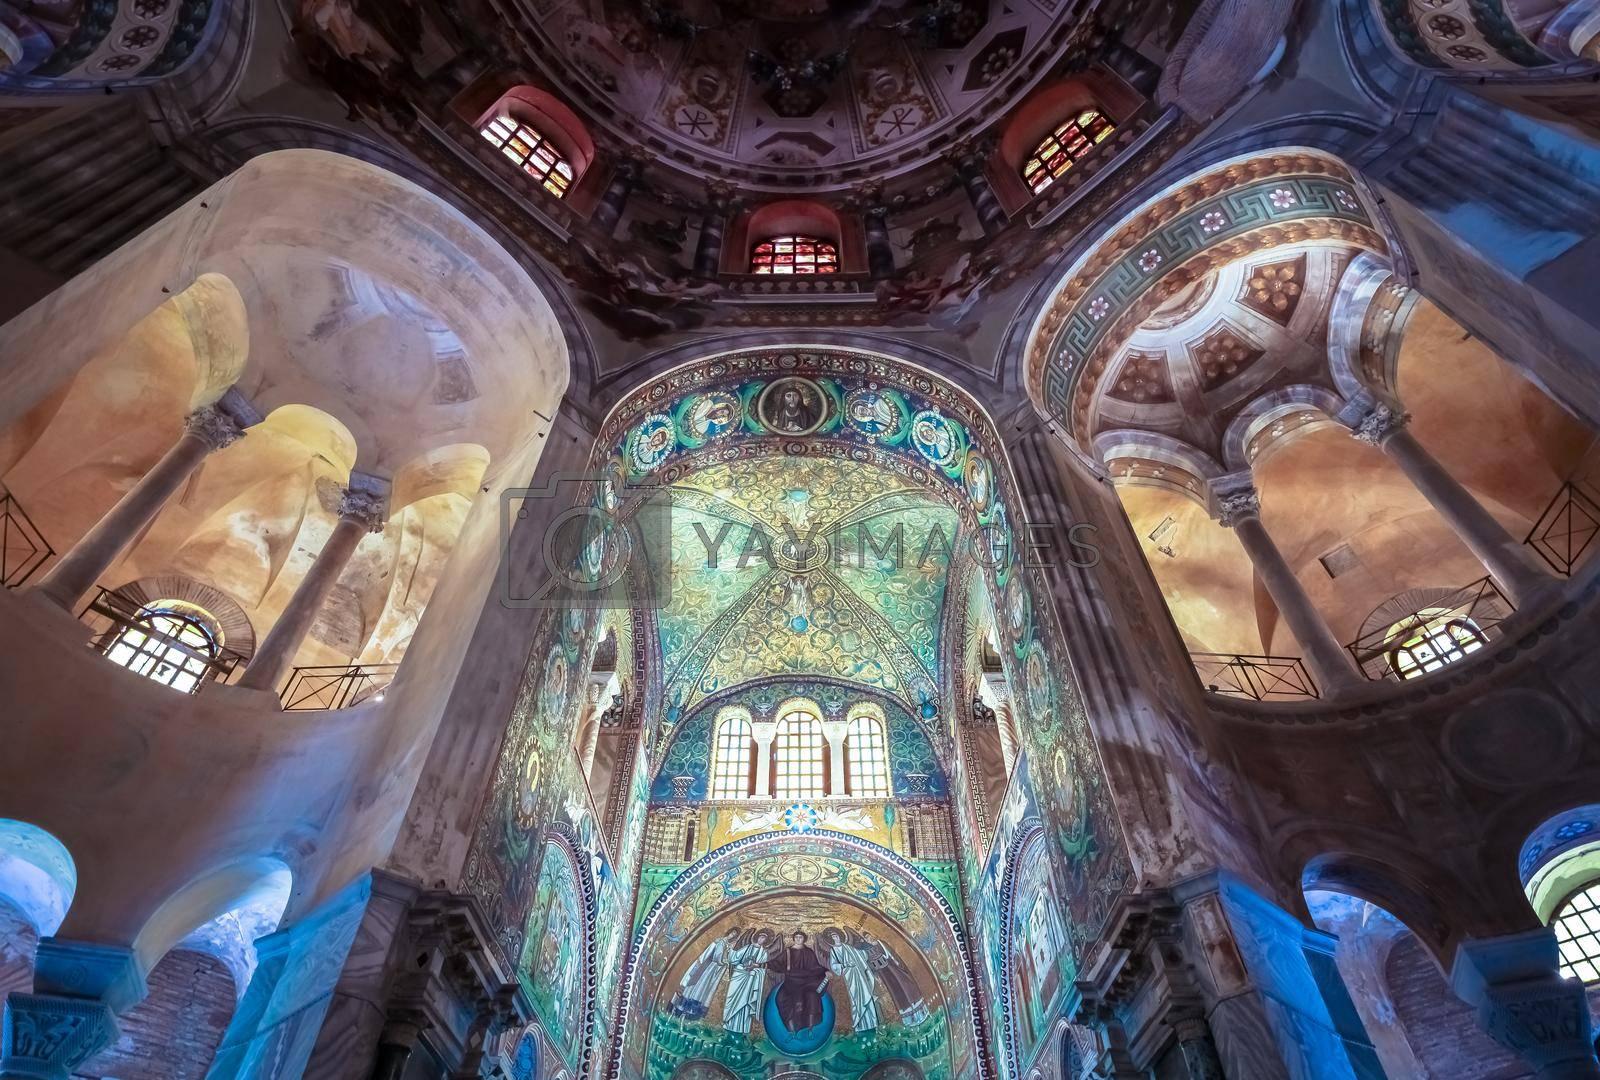 Royalty free image of Historic byzantine mosaic in Saint Vitale Basilica, Ravenna, Italy by Perseomedusa